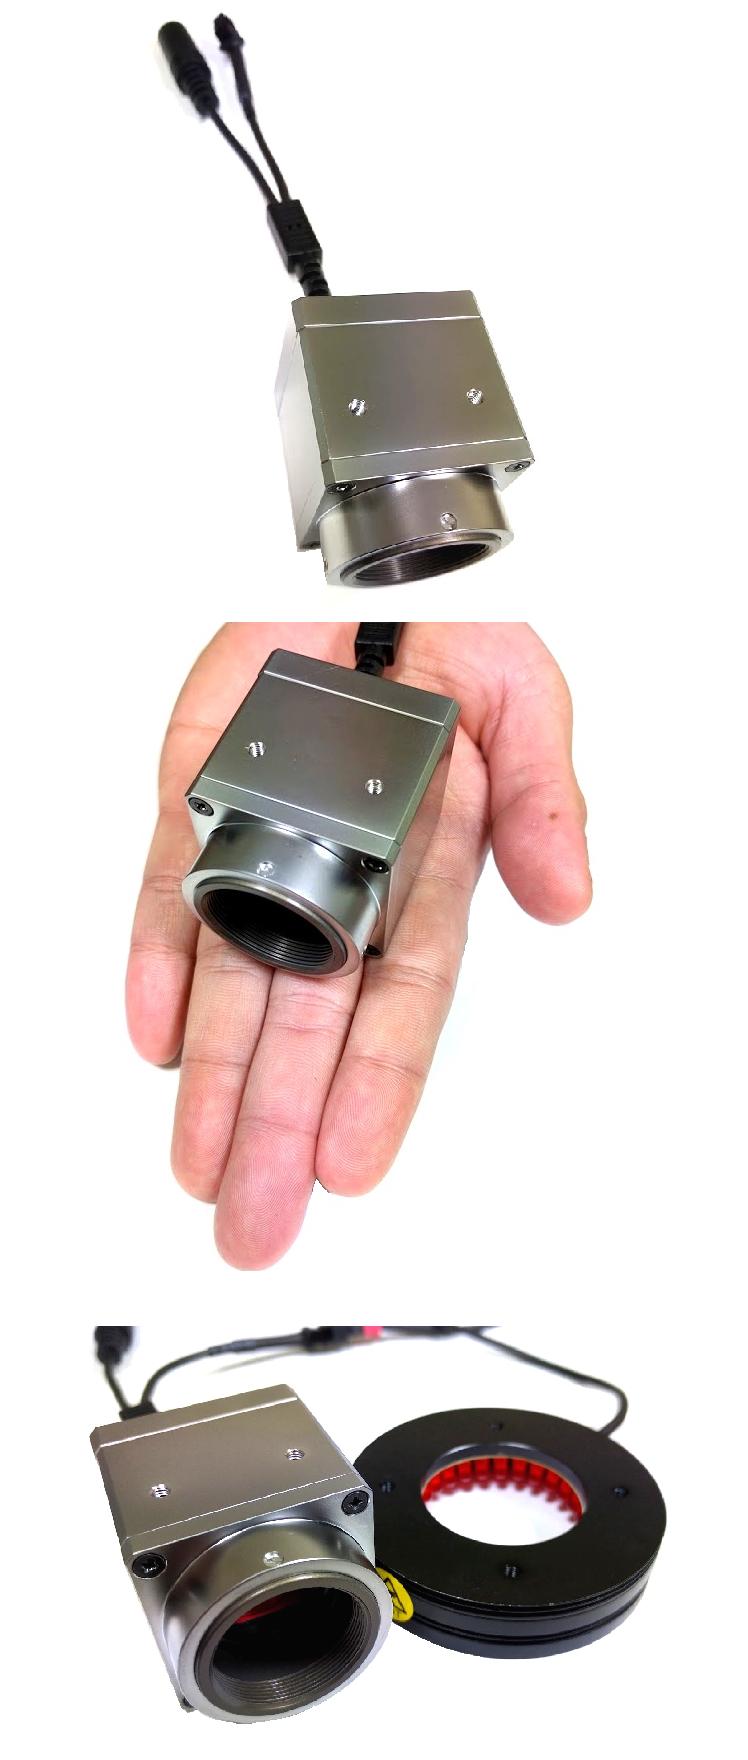 AISYS CYCLOPS U1000C攝影機-內建LED燈源控制器、10.0M像素、同步式、彩色